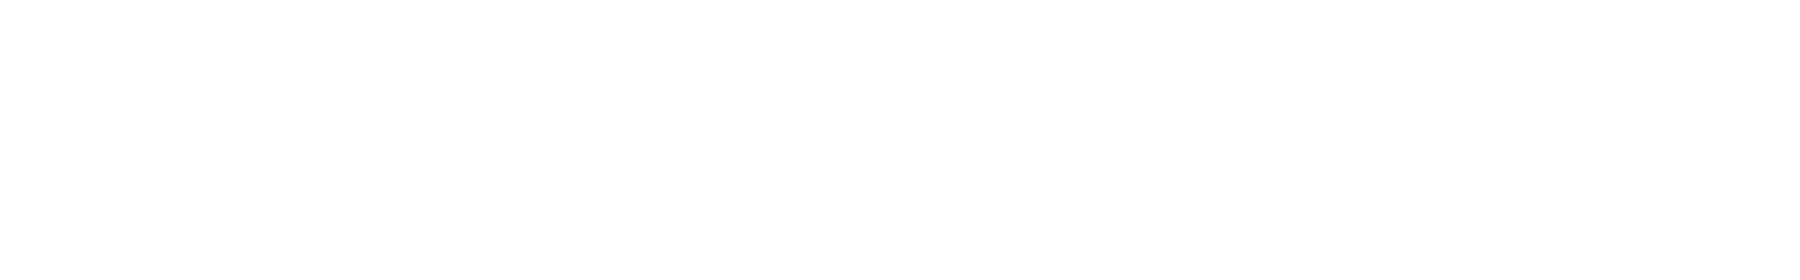 chant 24